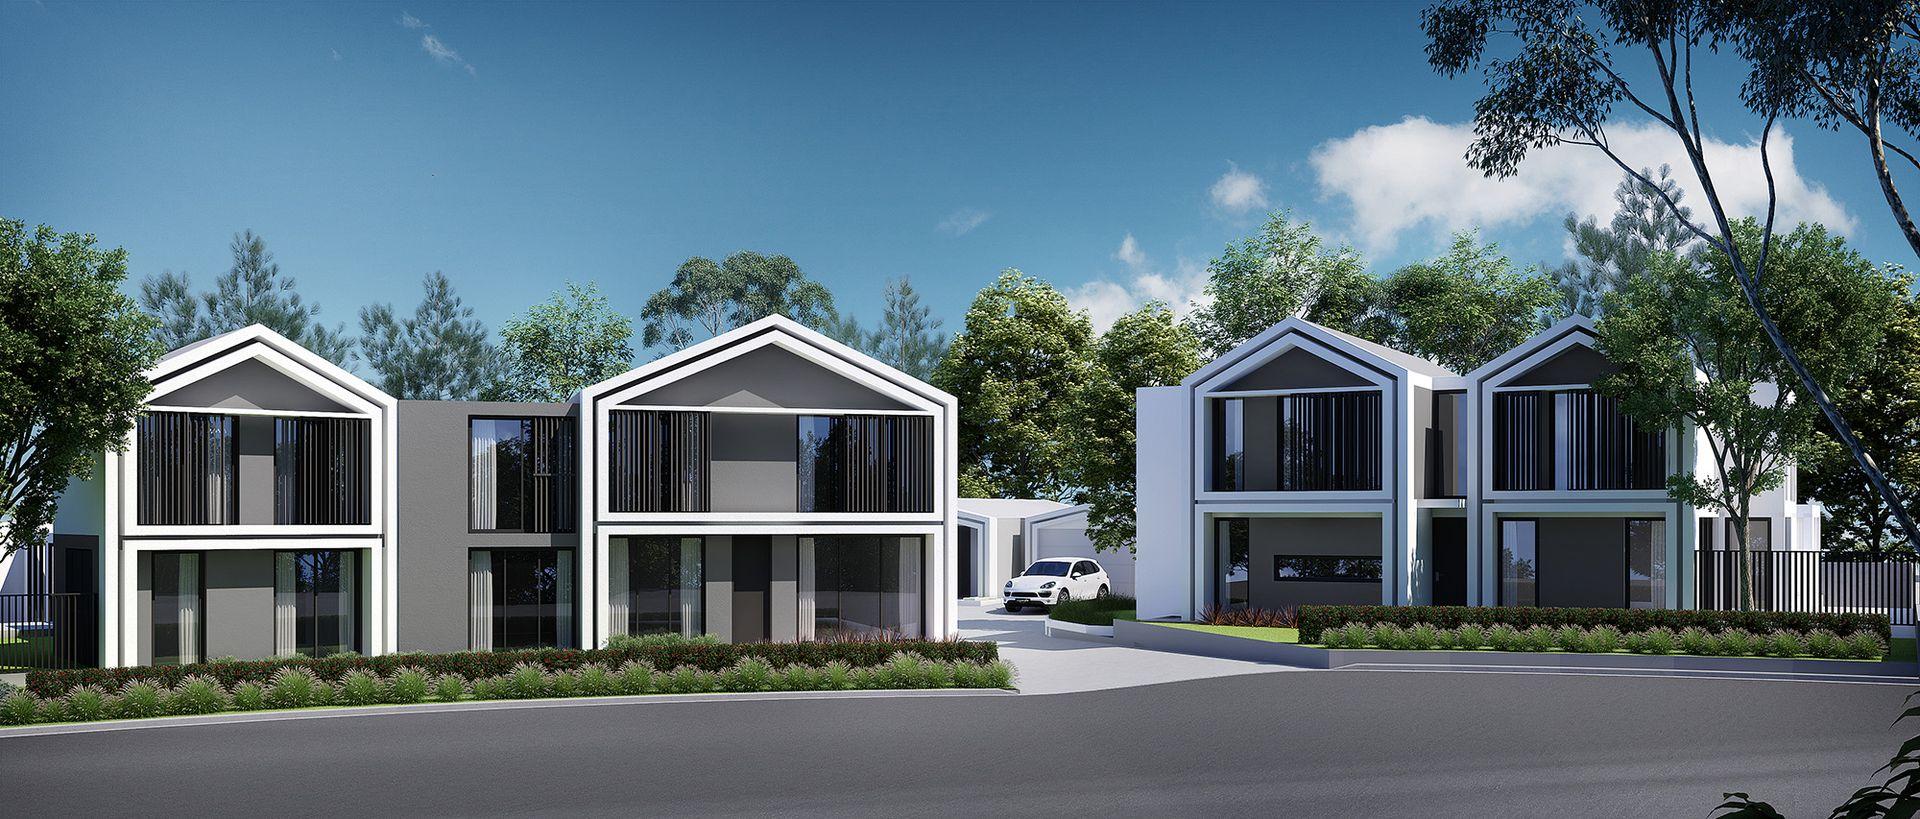 2/47-51 Irene Crescent, Eastwood NSW 2122, Image 0